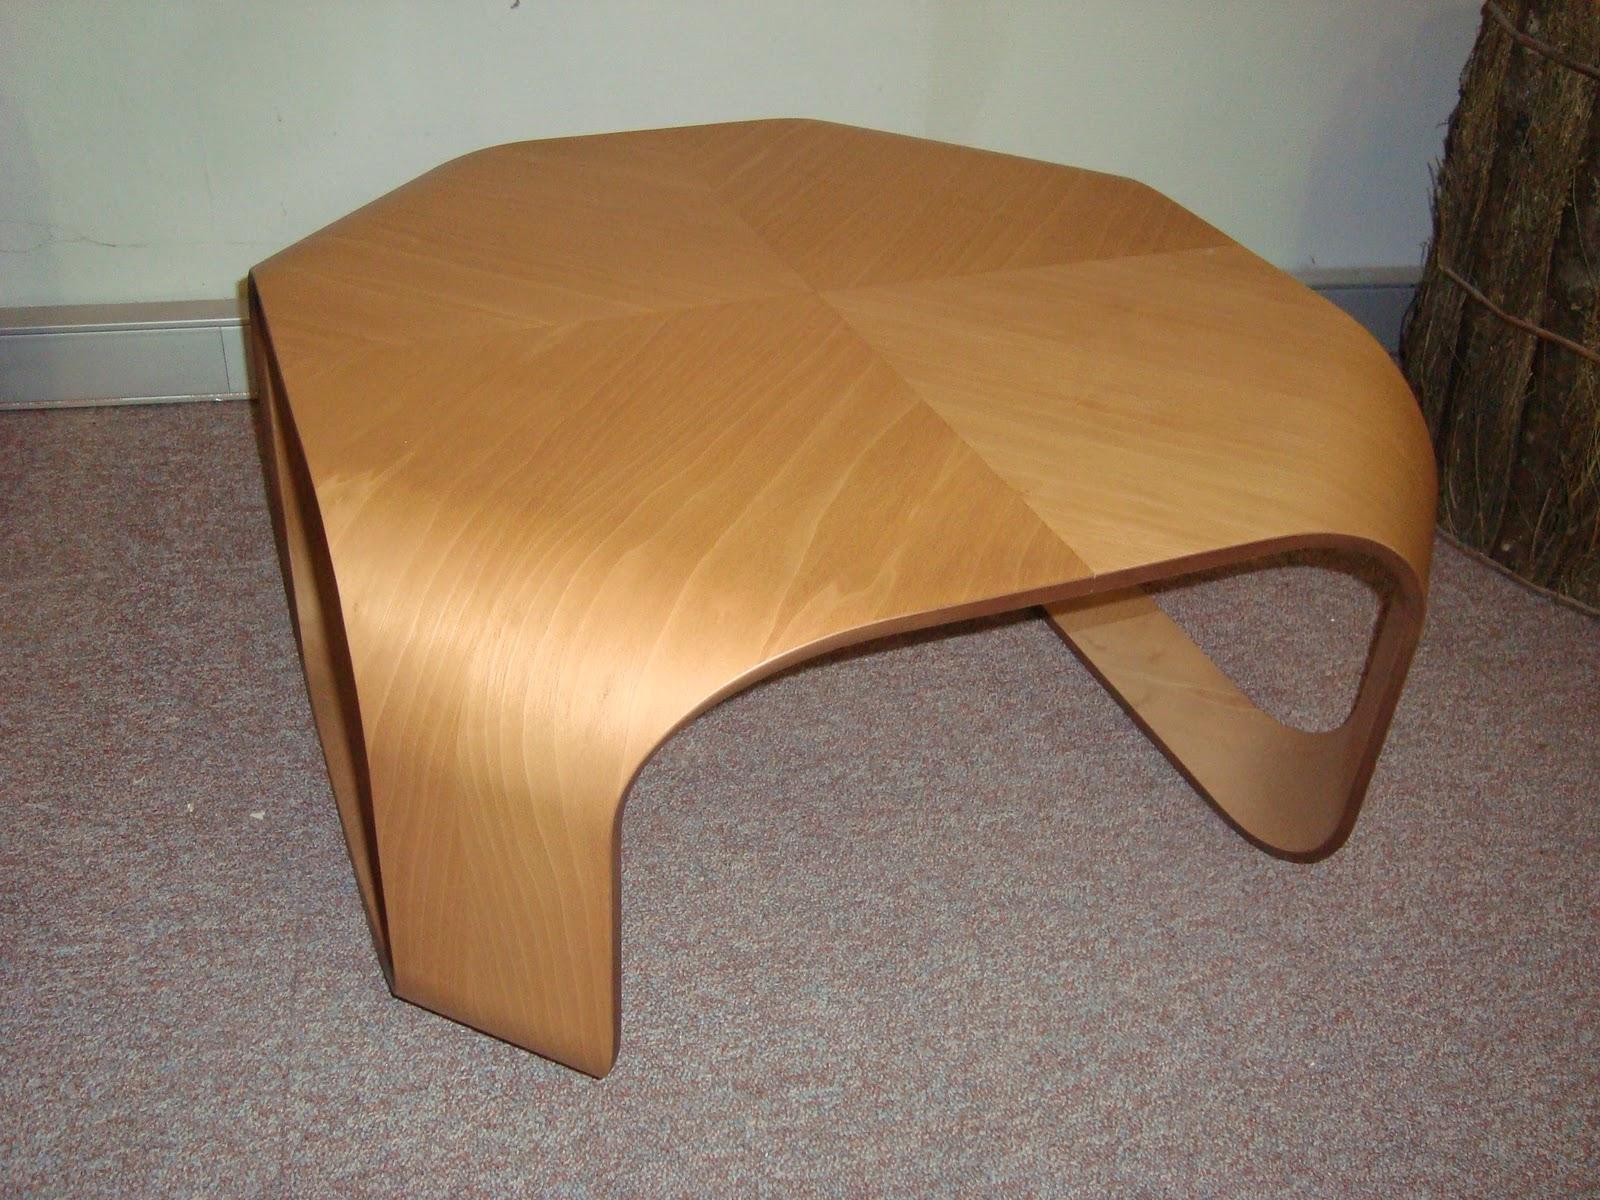 Liquidacion muebles de dise o mesas for Liquidacion muebles diseno